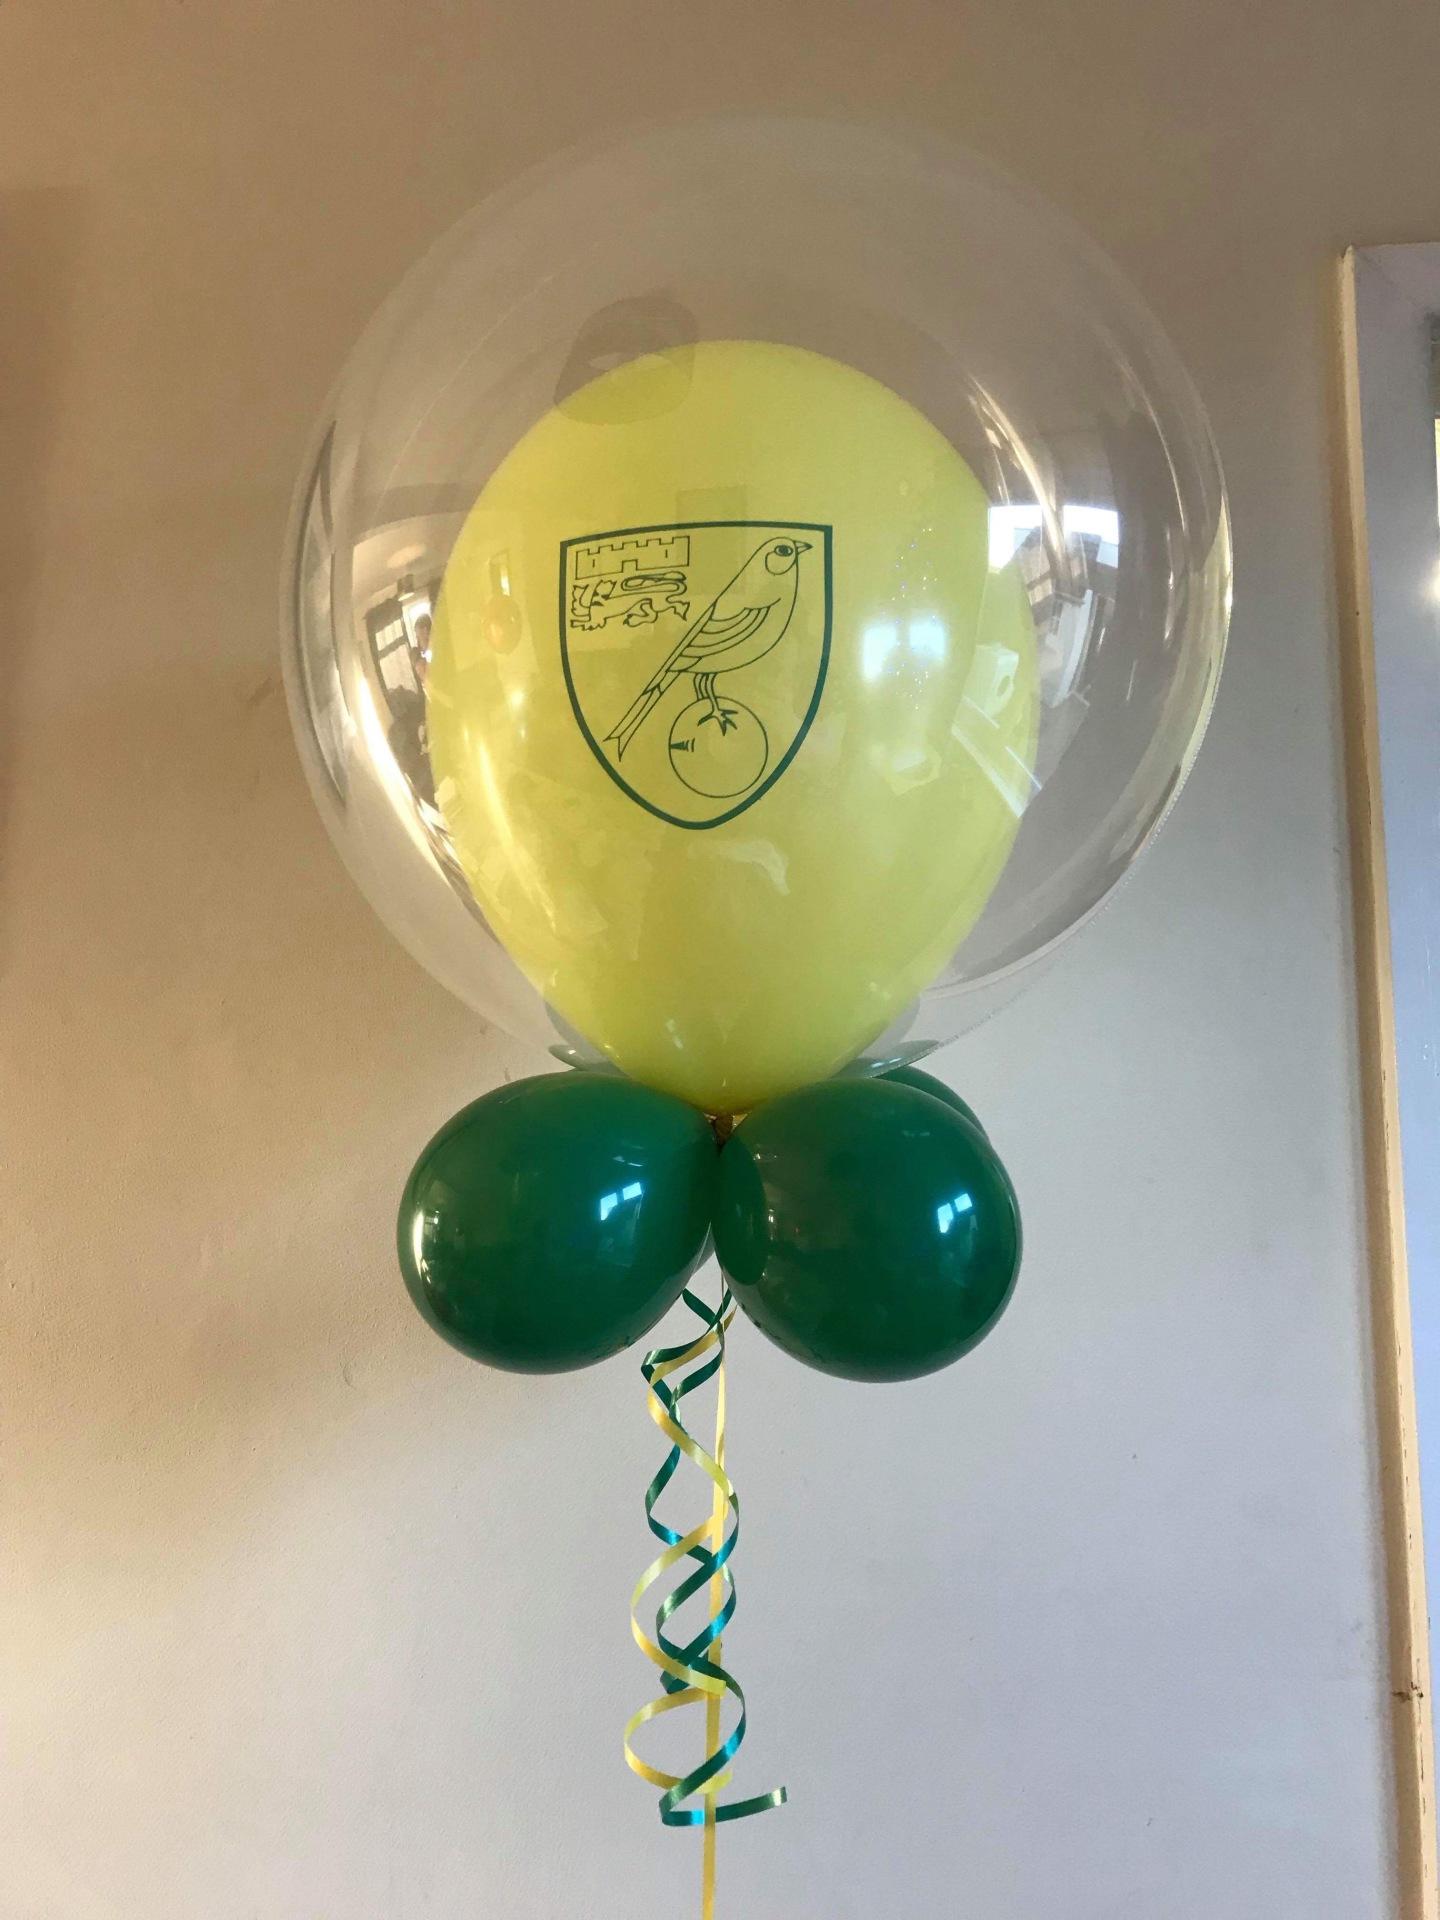 Norwich City bubble balloon